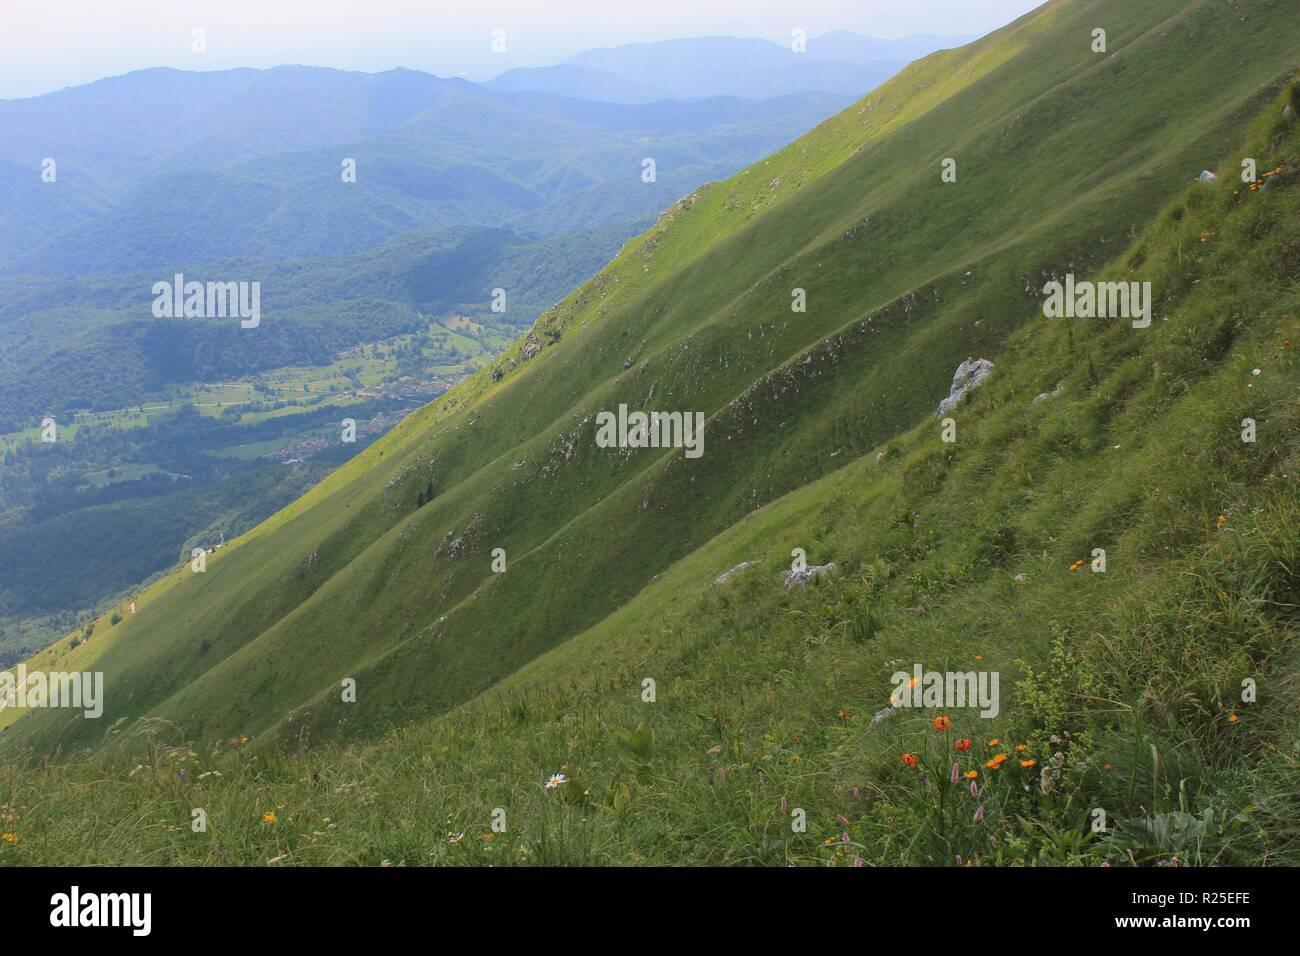 Steep alpine slopes of Mount Kobariski Stol, Julian Alps,  Alpe Adria trail, Slovenia, central Europe - Stock Image